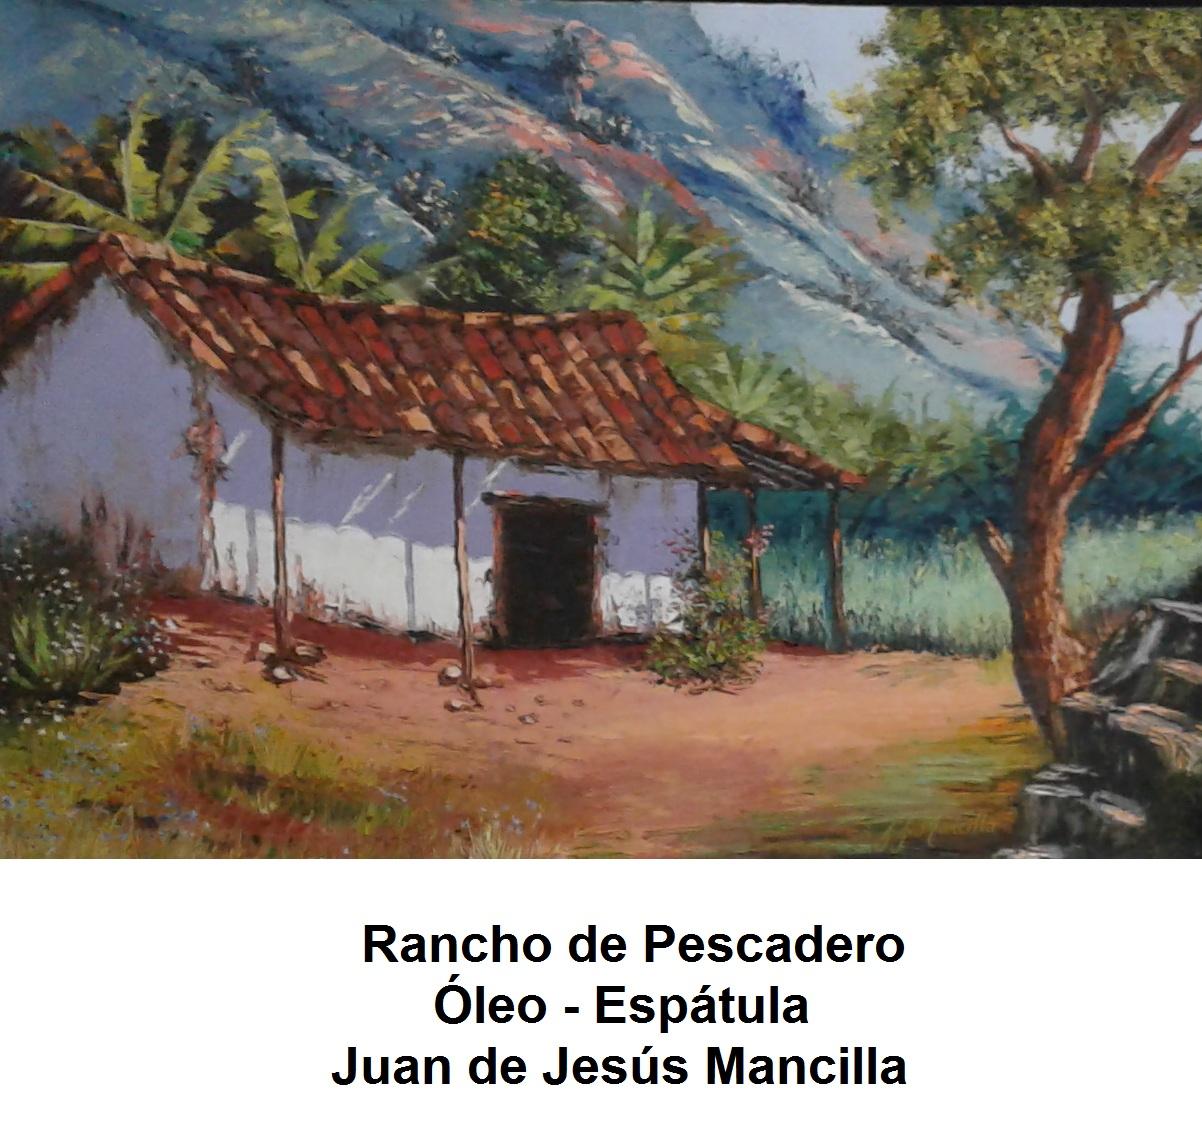 Rancho de Pescadero